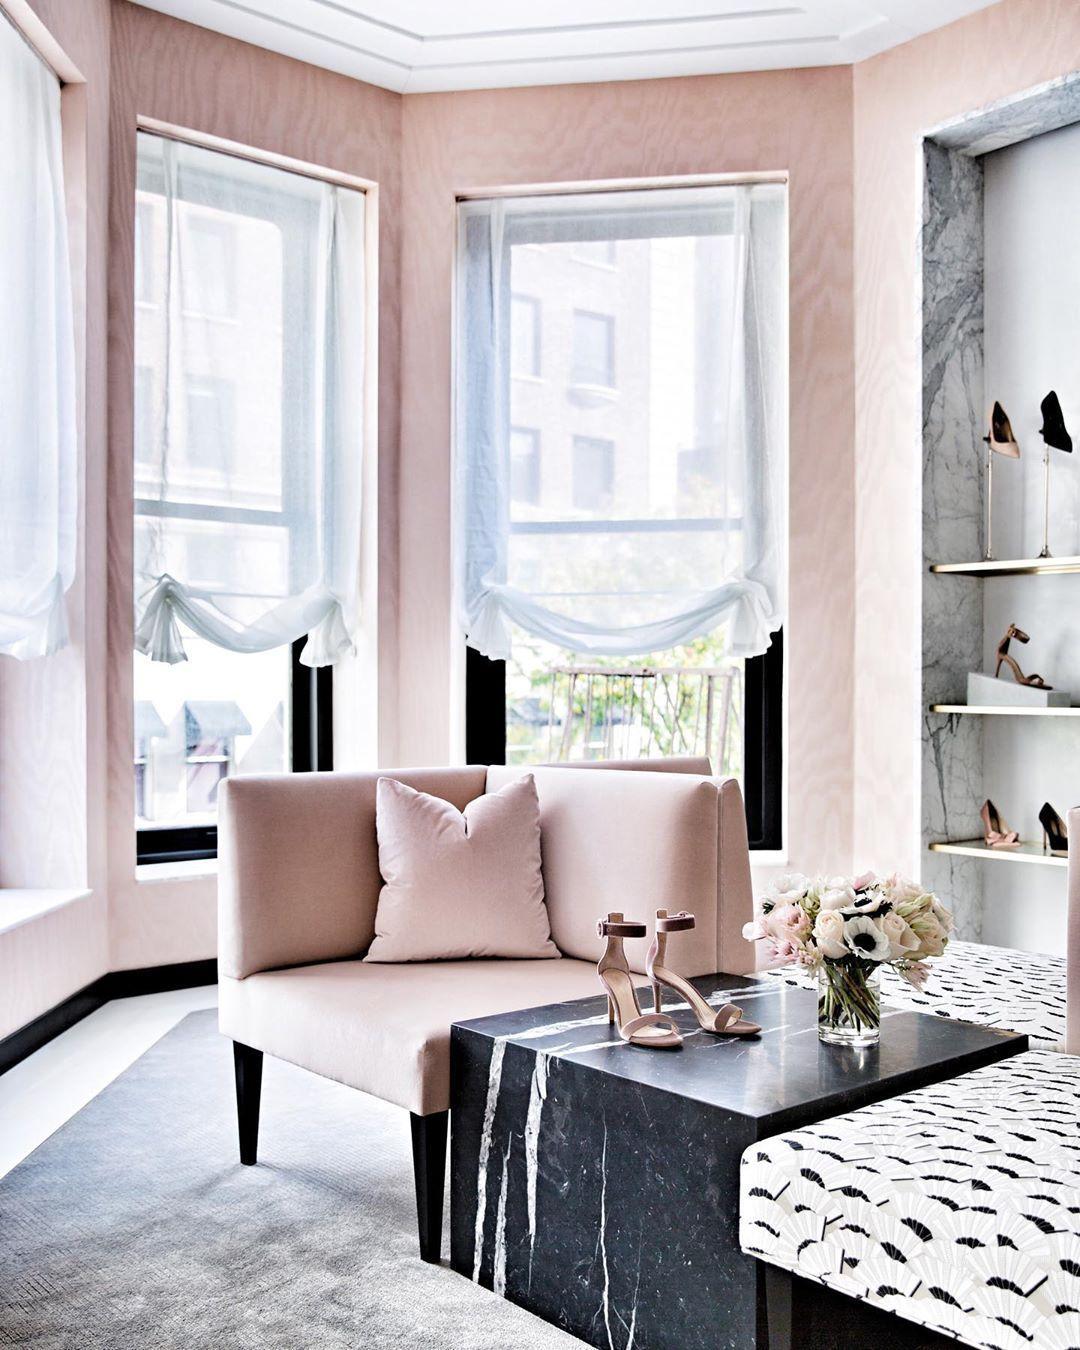 Ryan Korban S Amazing Projects In 2020 Funky Home Decor Interior Design Books Bedroom Interior